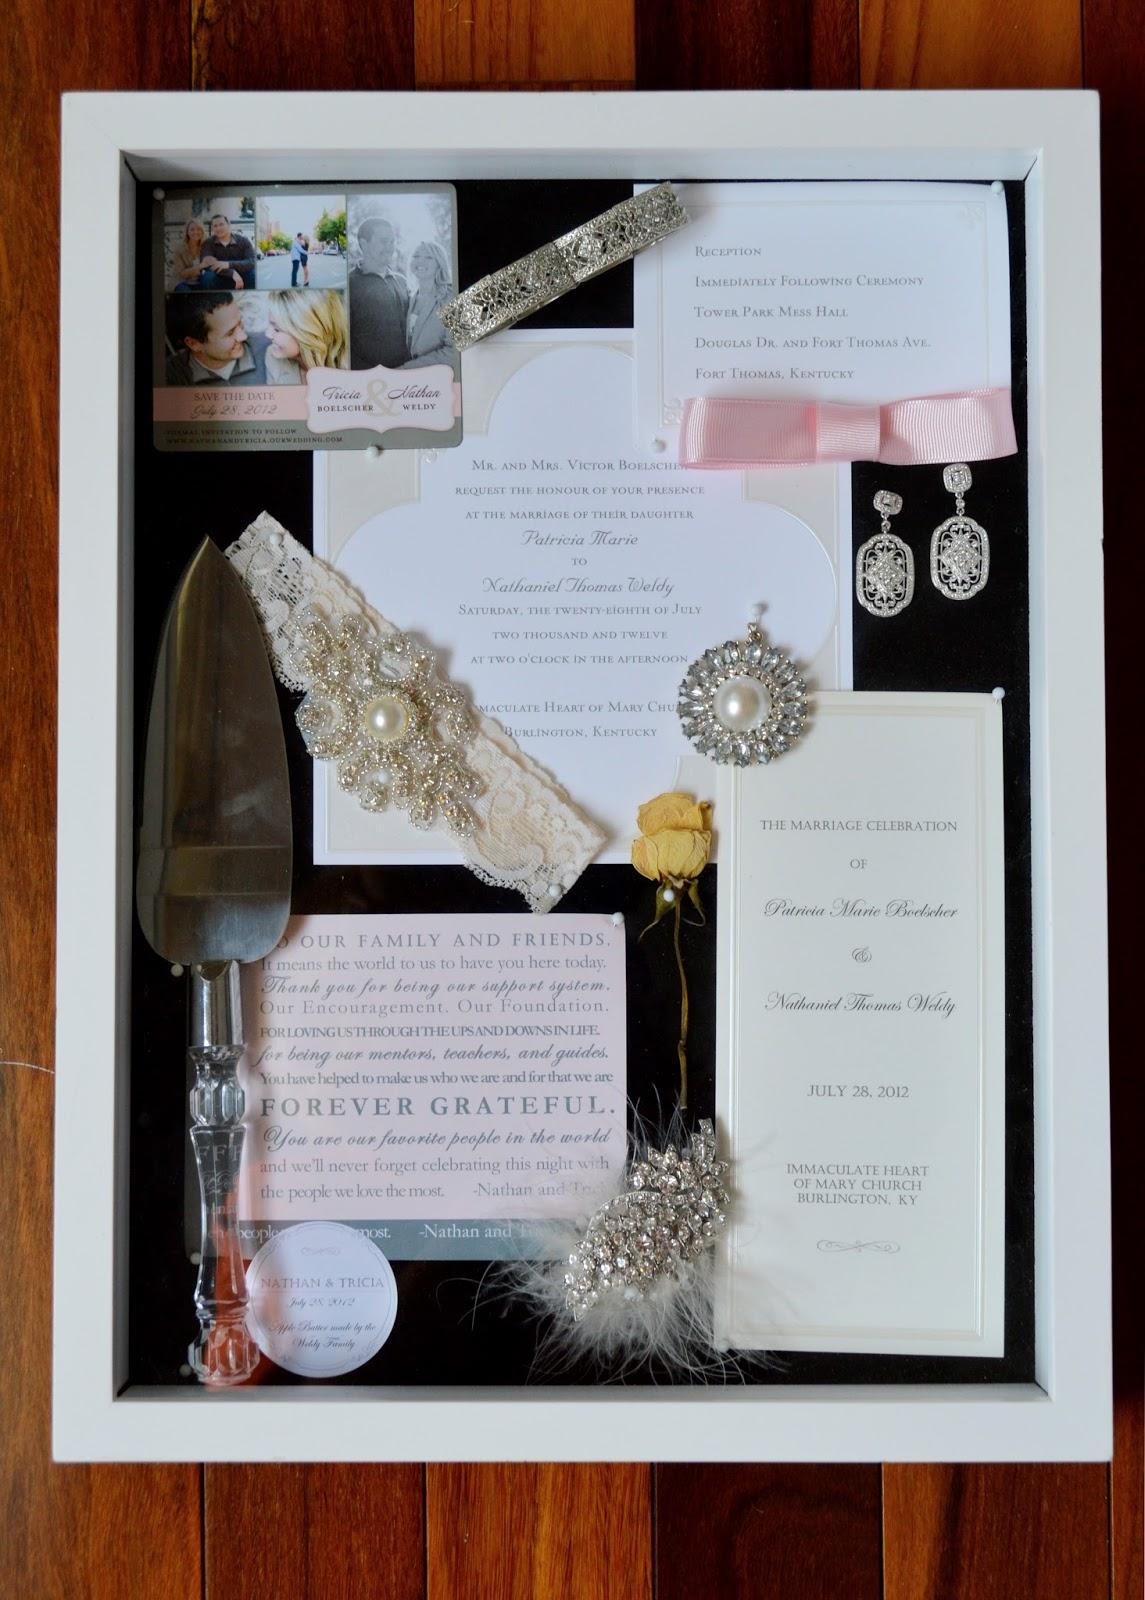 our big day displayed diy wedding wedding shadow box Our Big Day Displayed DIY Wedding Shadow Box